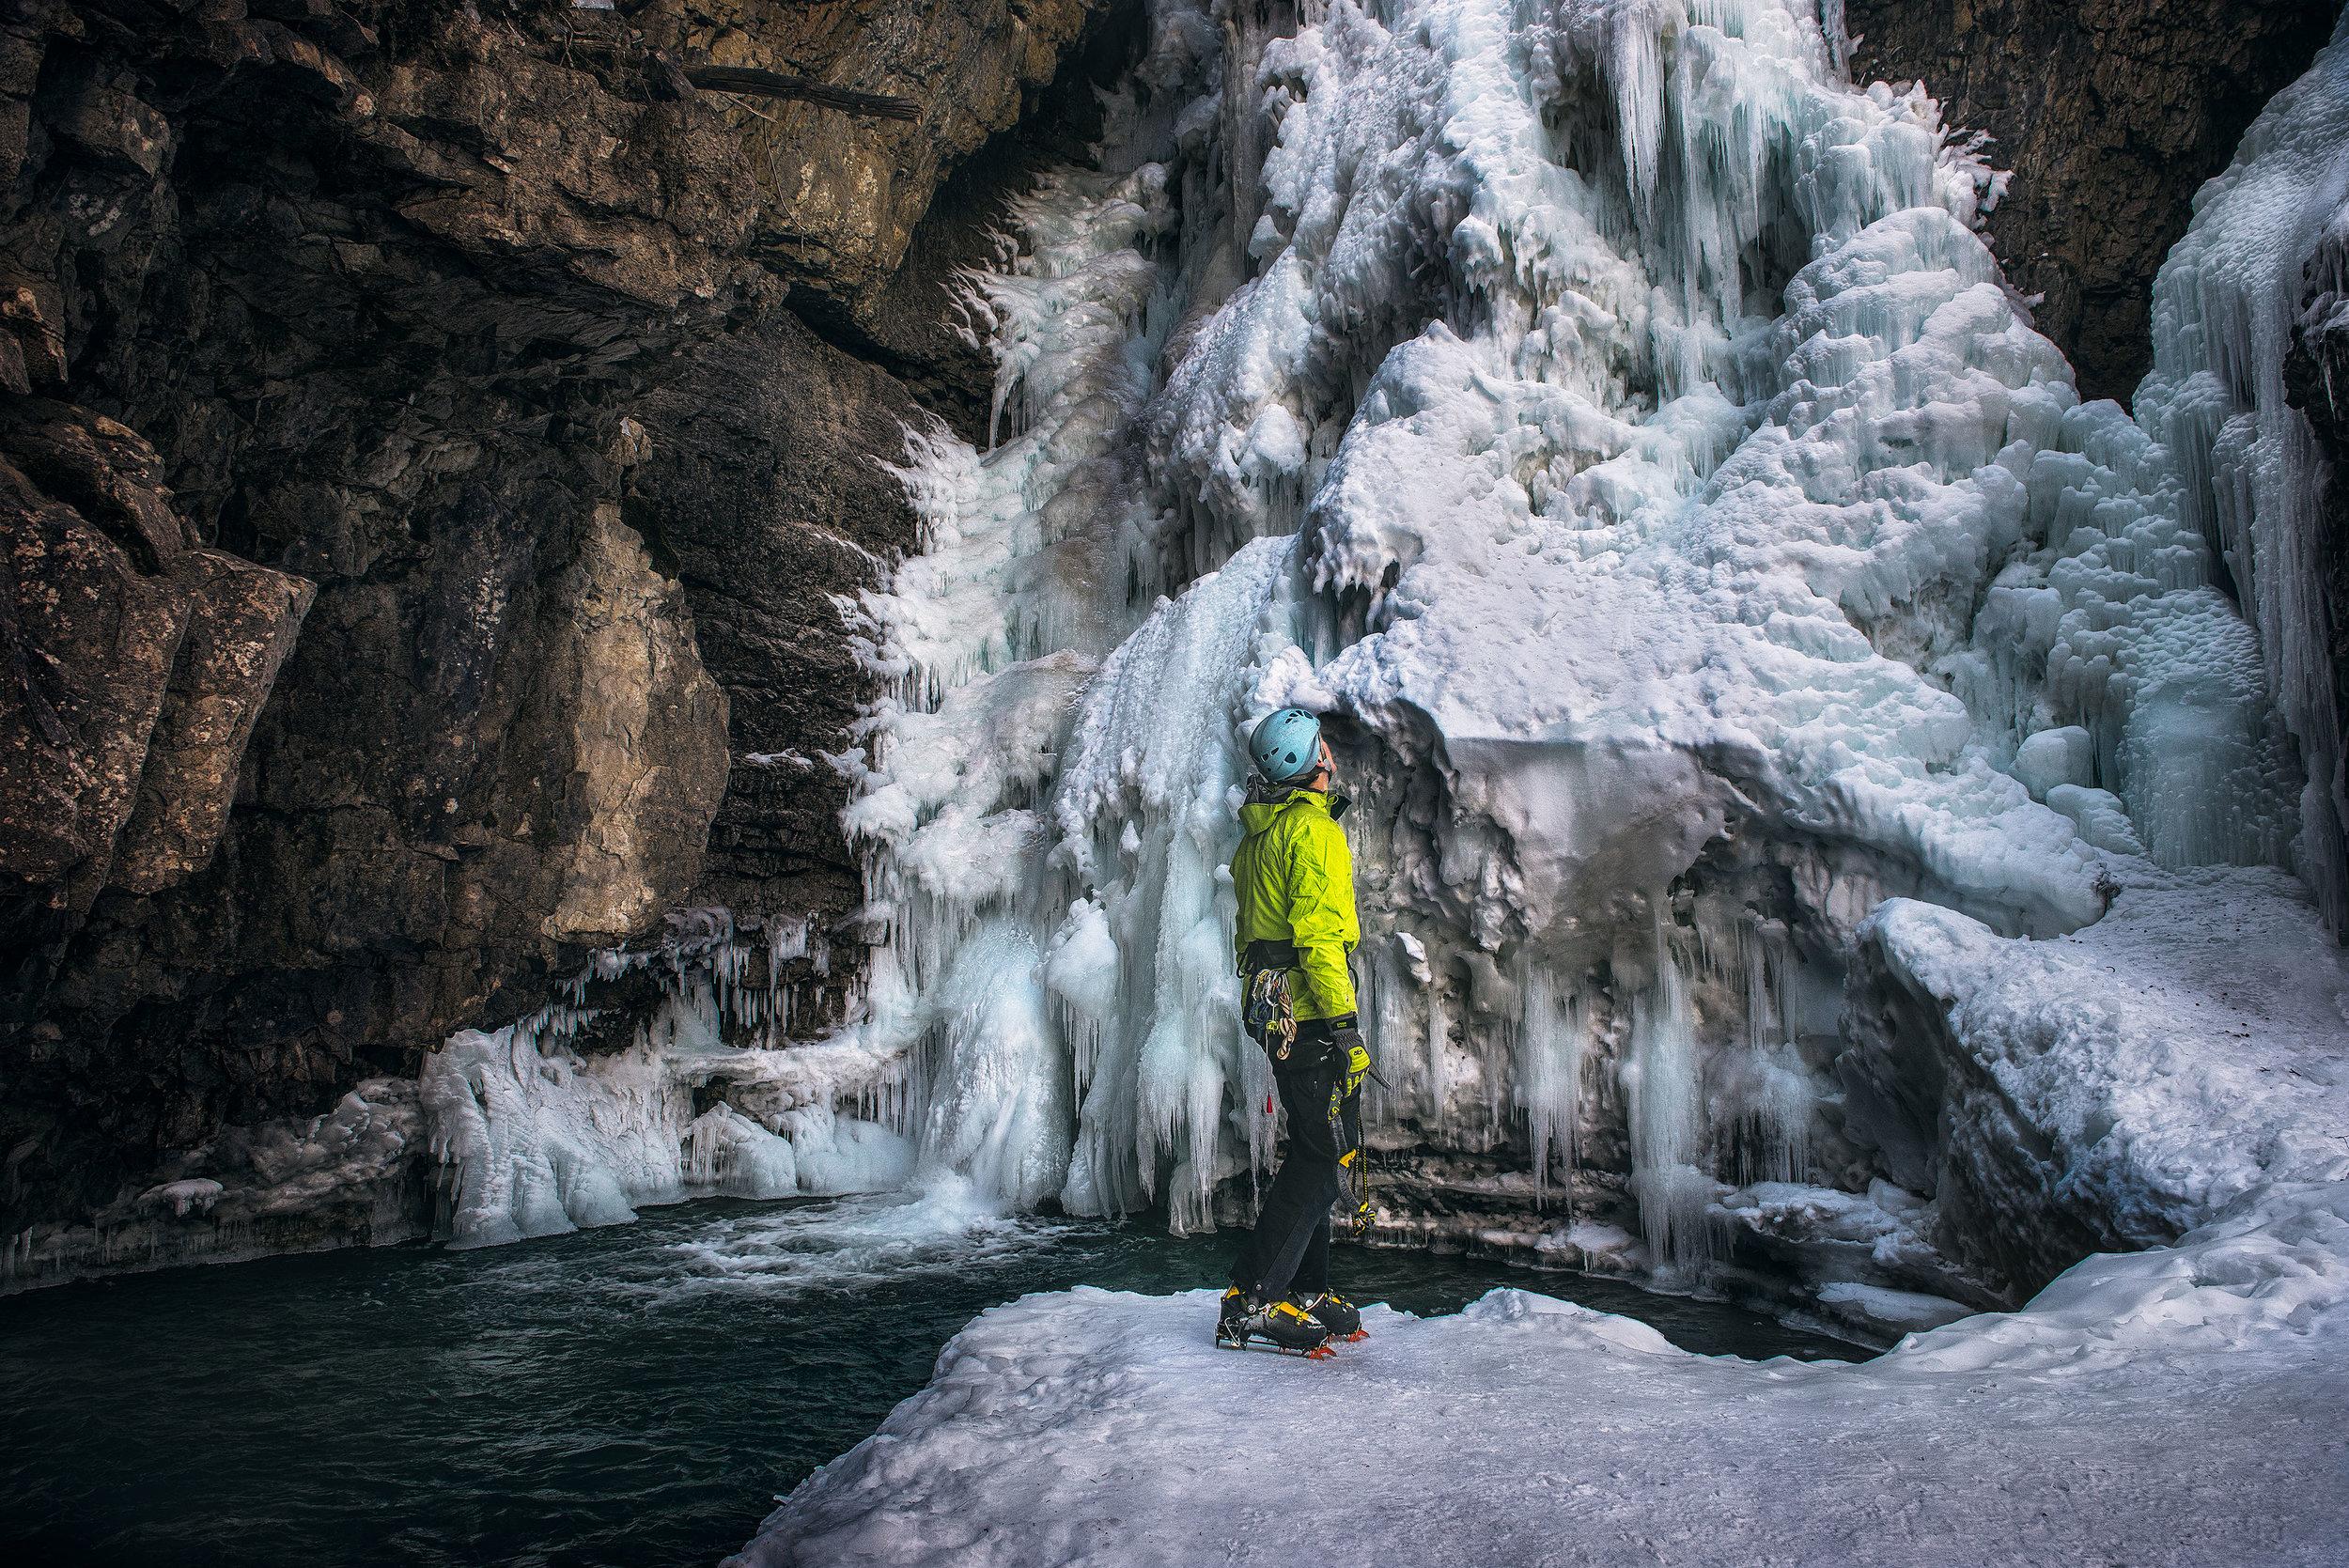 austin-trigg-ice-climbing-banff-Johnston-Canyon-frozen-waterfall.jpg